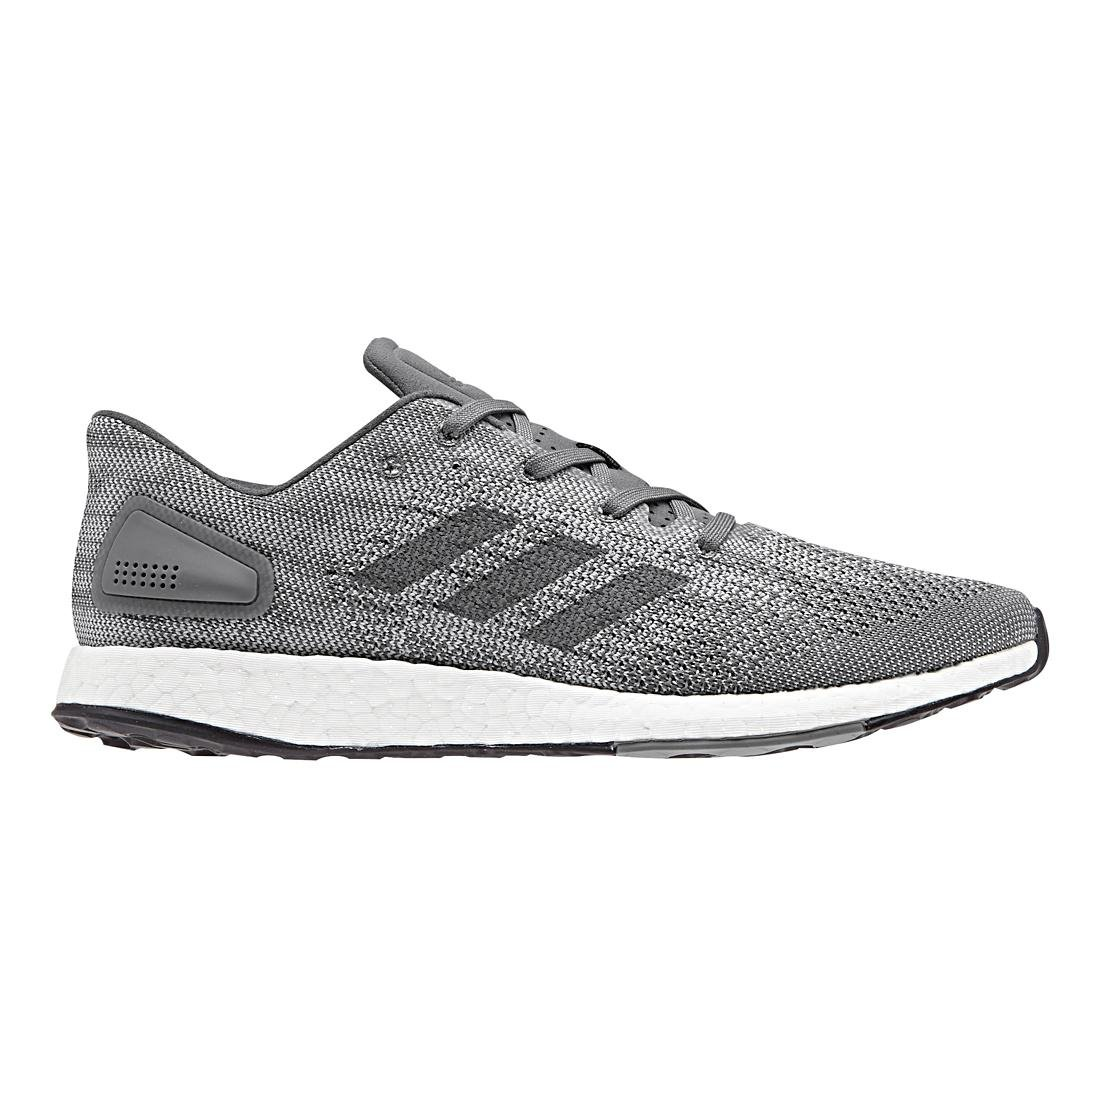 gris Two-gris Four 44 EU adidas Chaussures Athlétiques